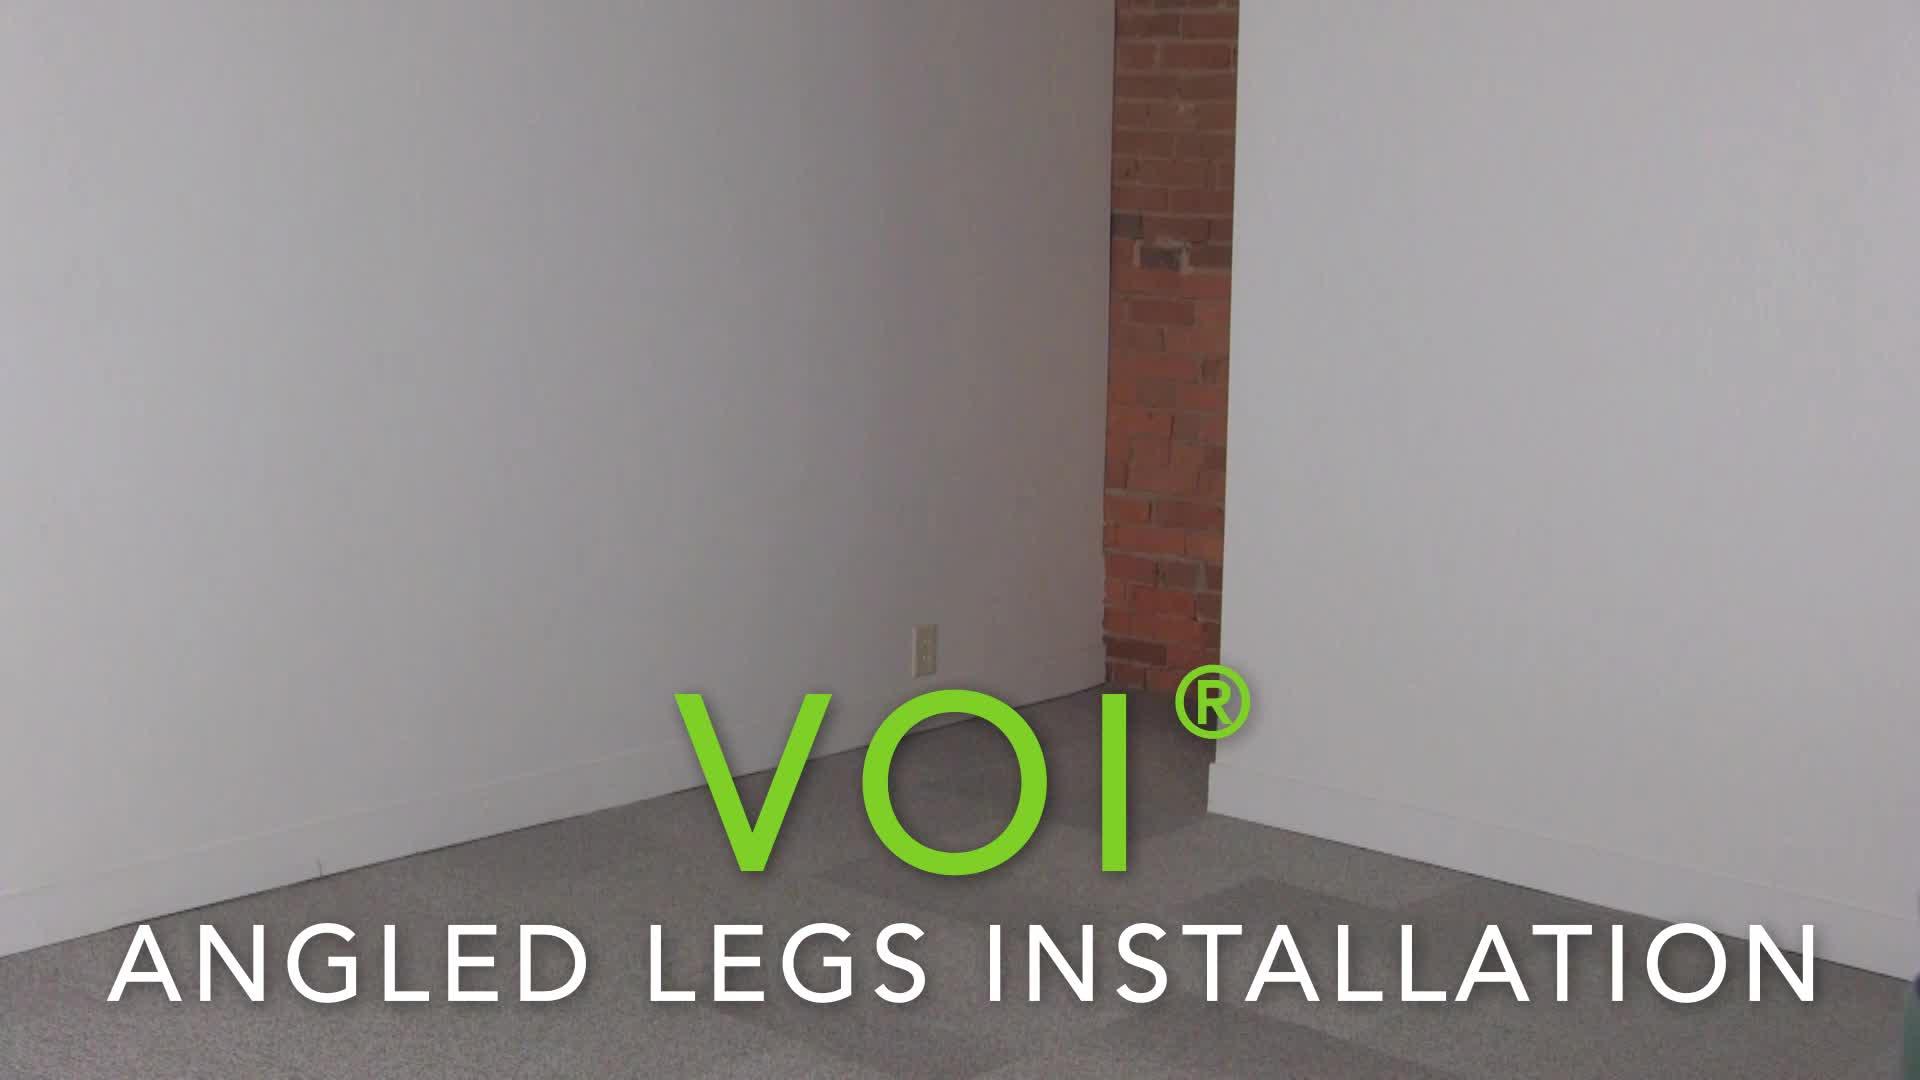 Voi Angled Legs Installation video link